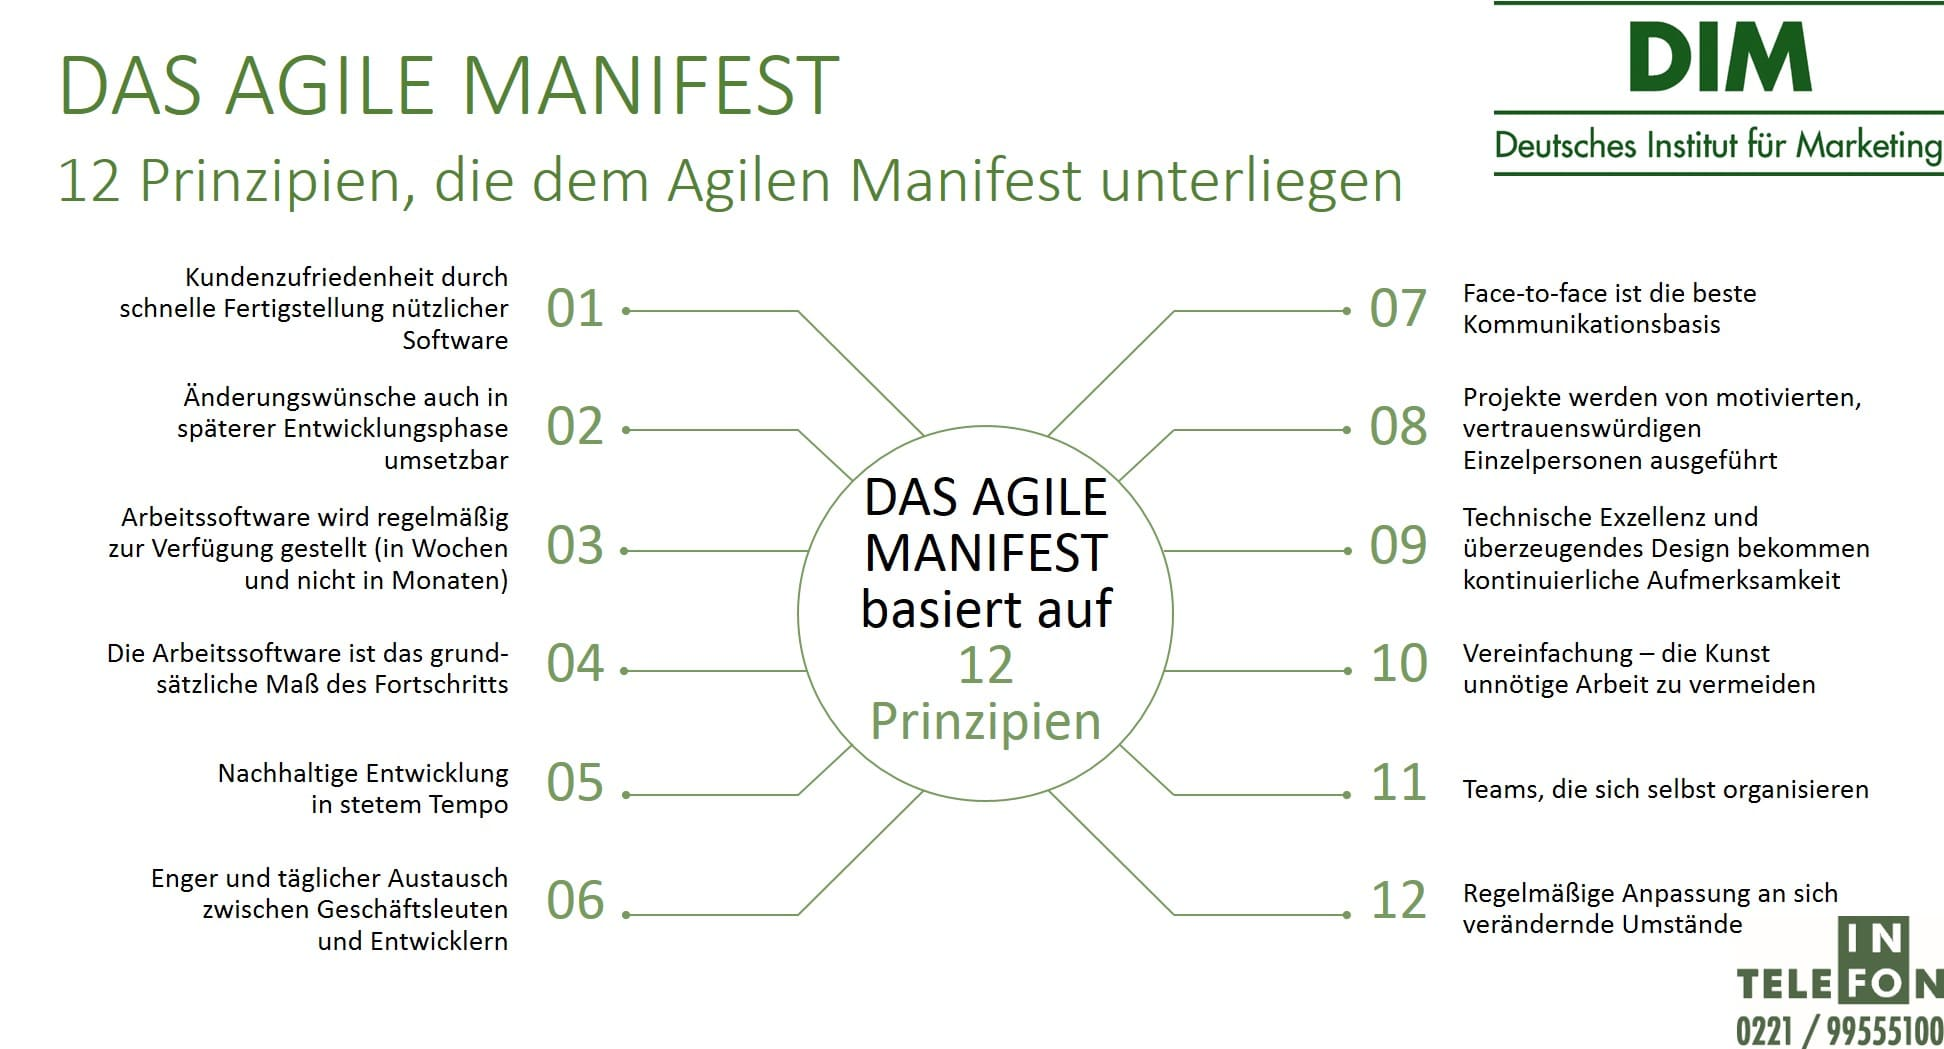 12 Prinzipien Agiles Manifest